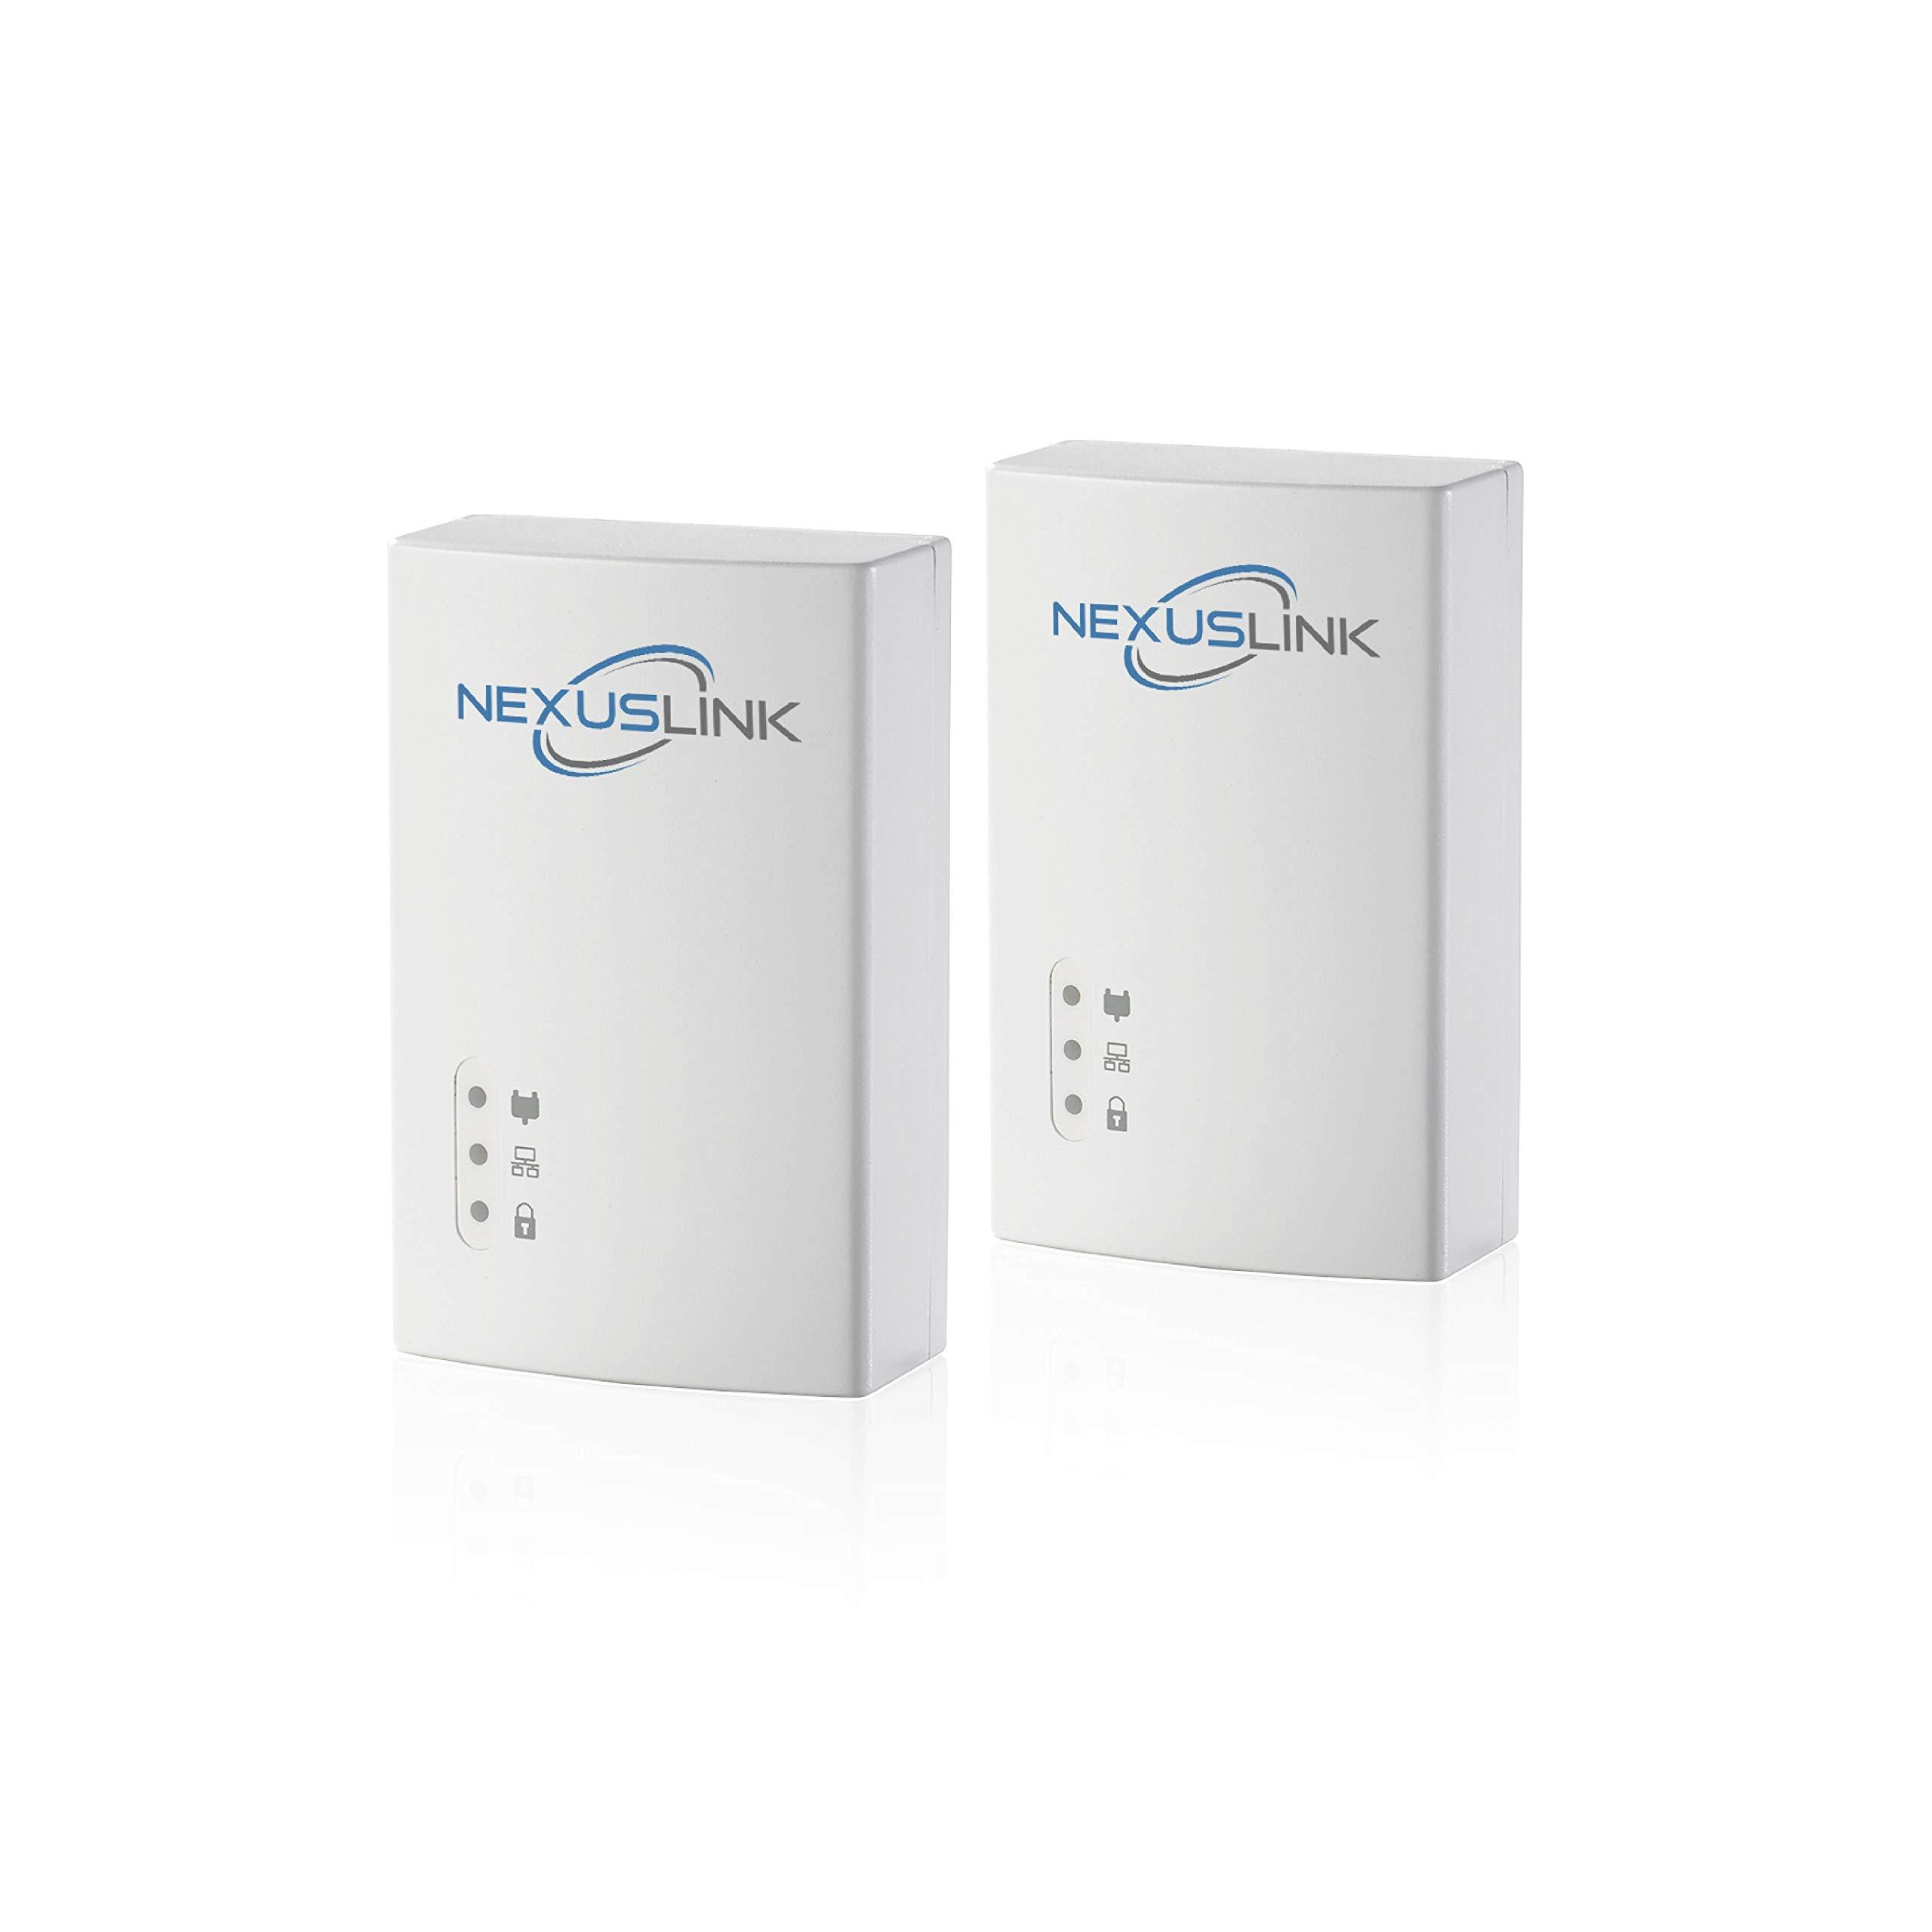 NexusLink Powerline G.hn Powerline Adapter | 1200Mbps | 2-Unit Kit (GPL-1200-KIT) by NEXUSLINK